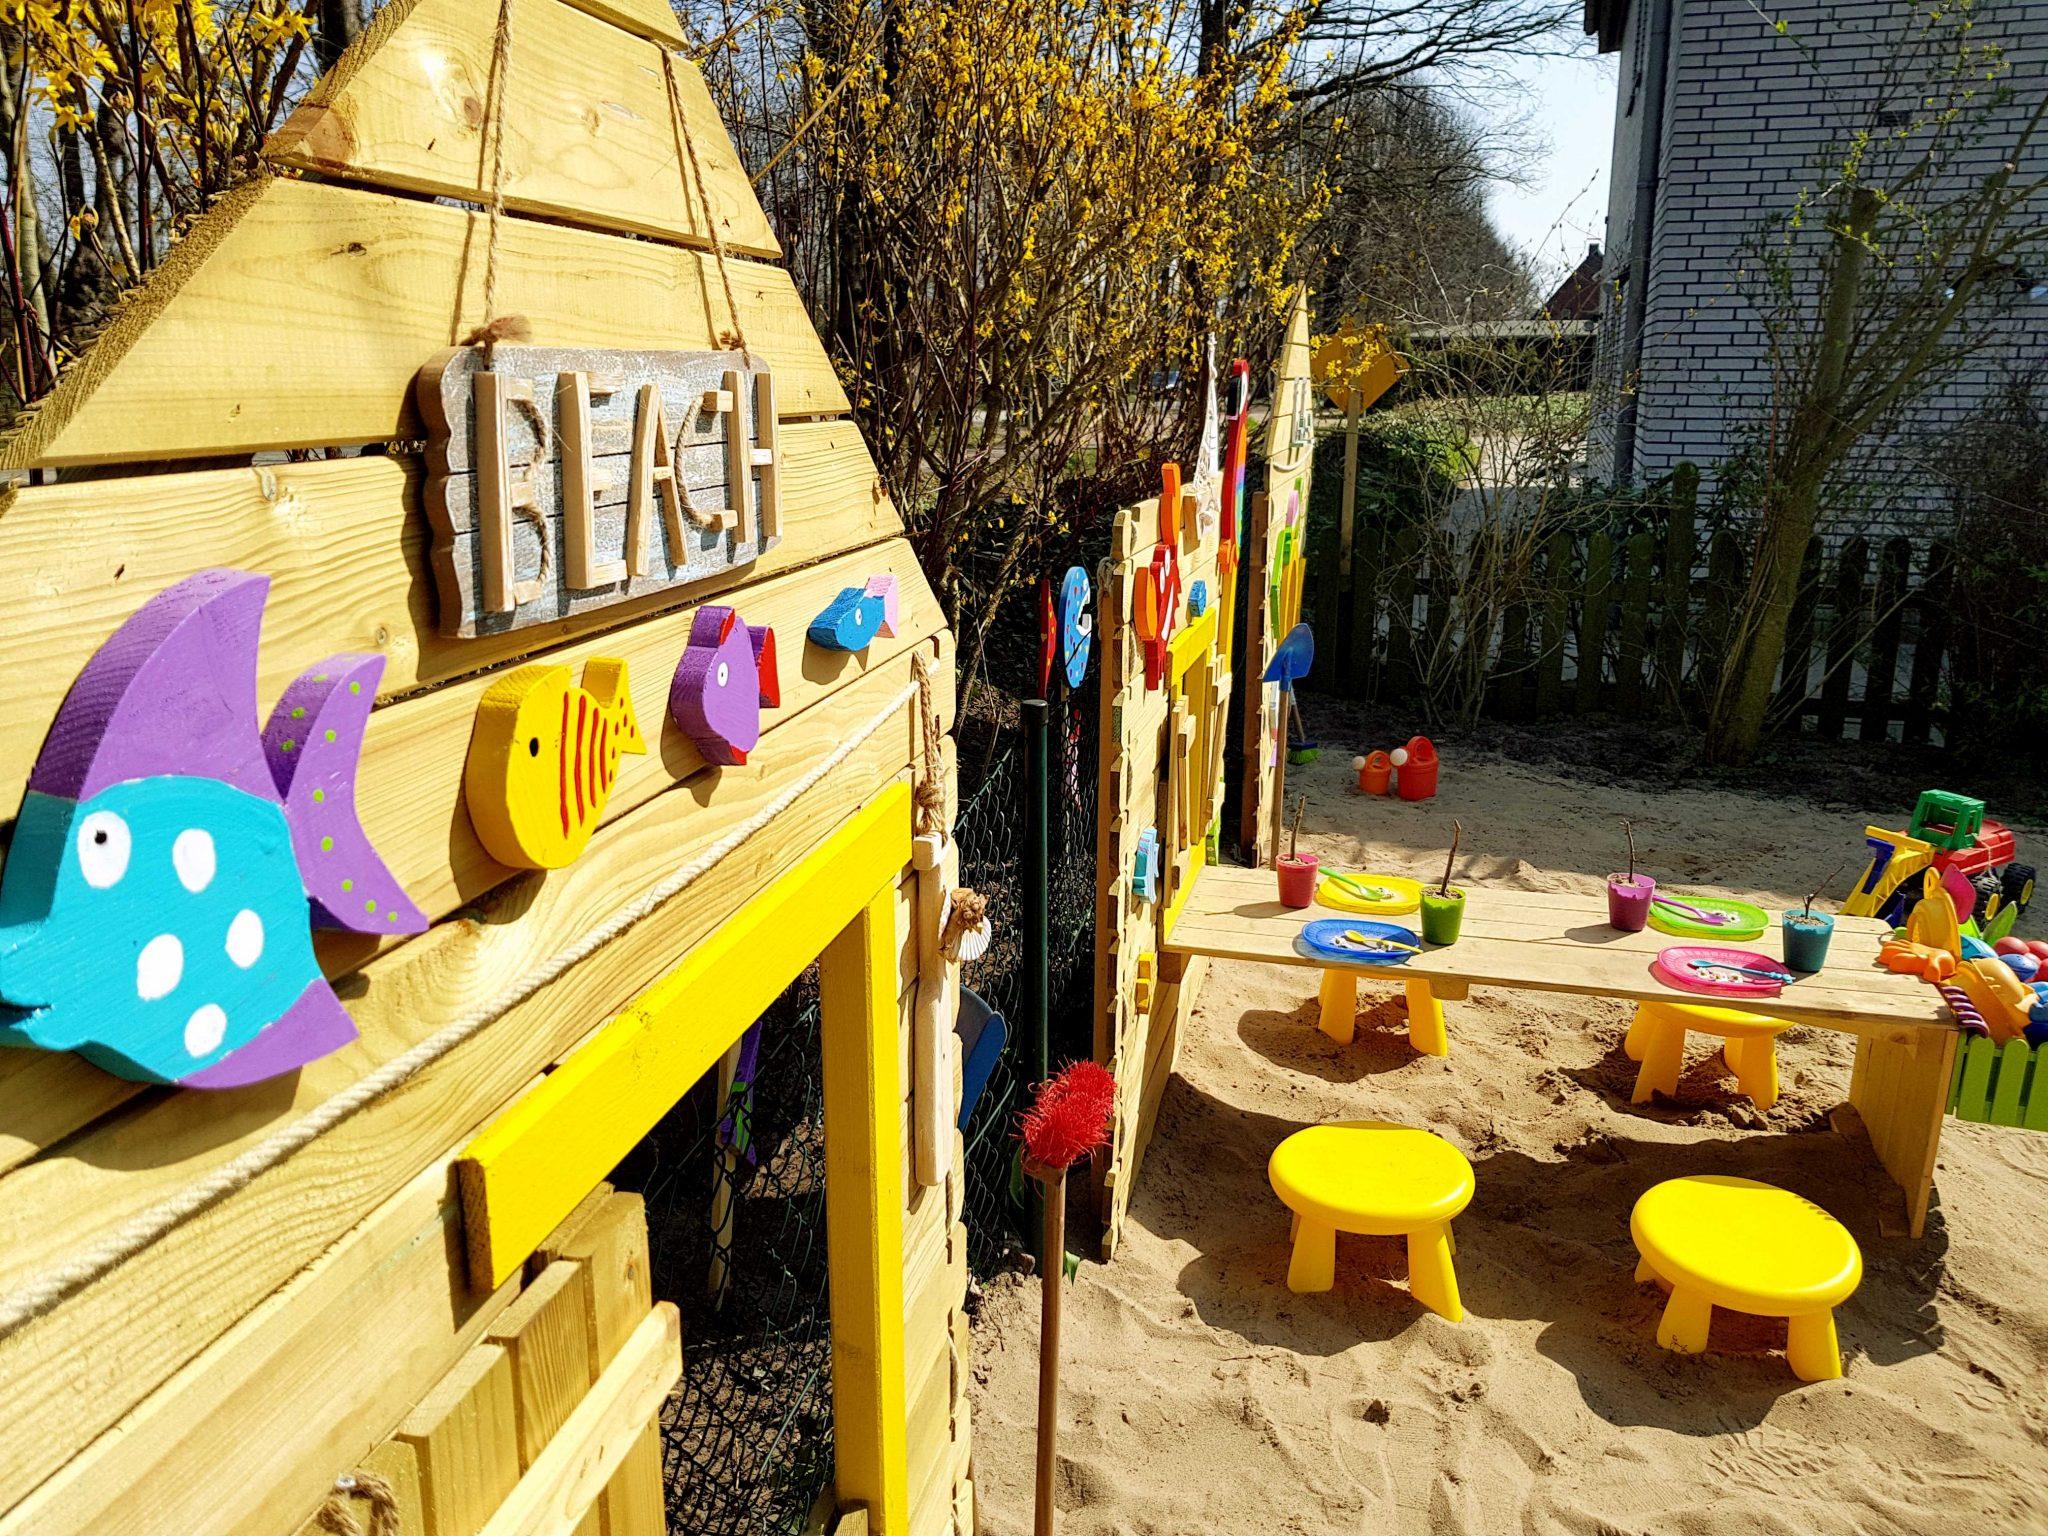 Kita Kid Zone Kinderbetreuung Garten1 23 - Kinder-Beachclub